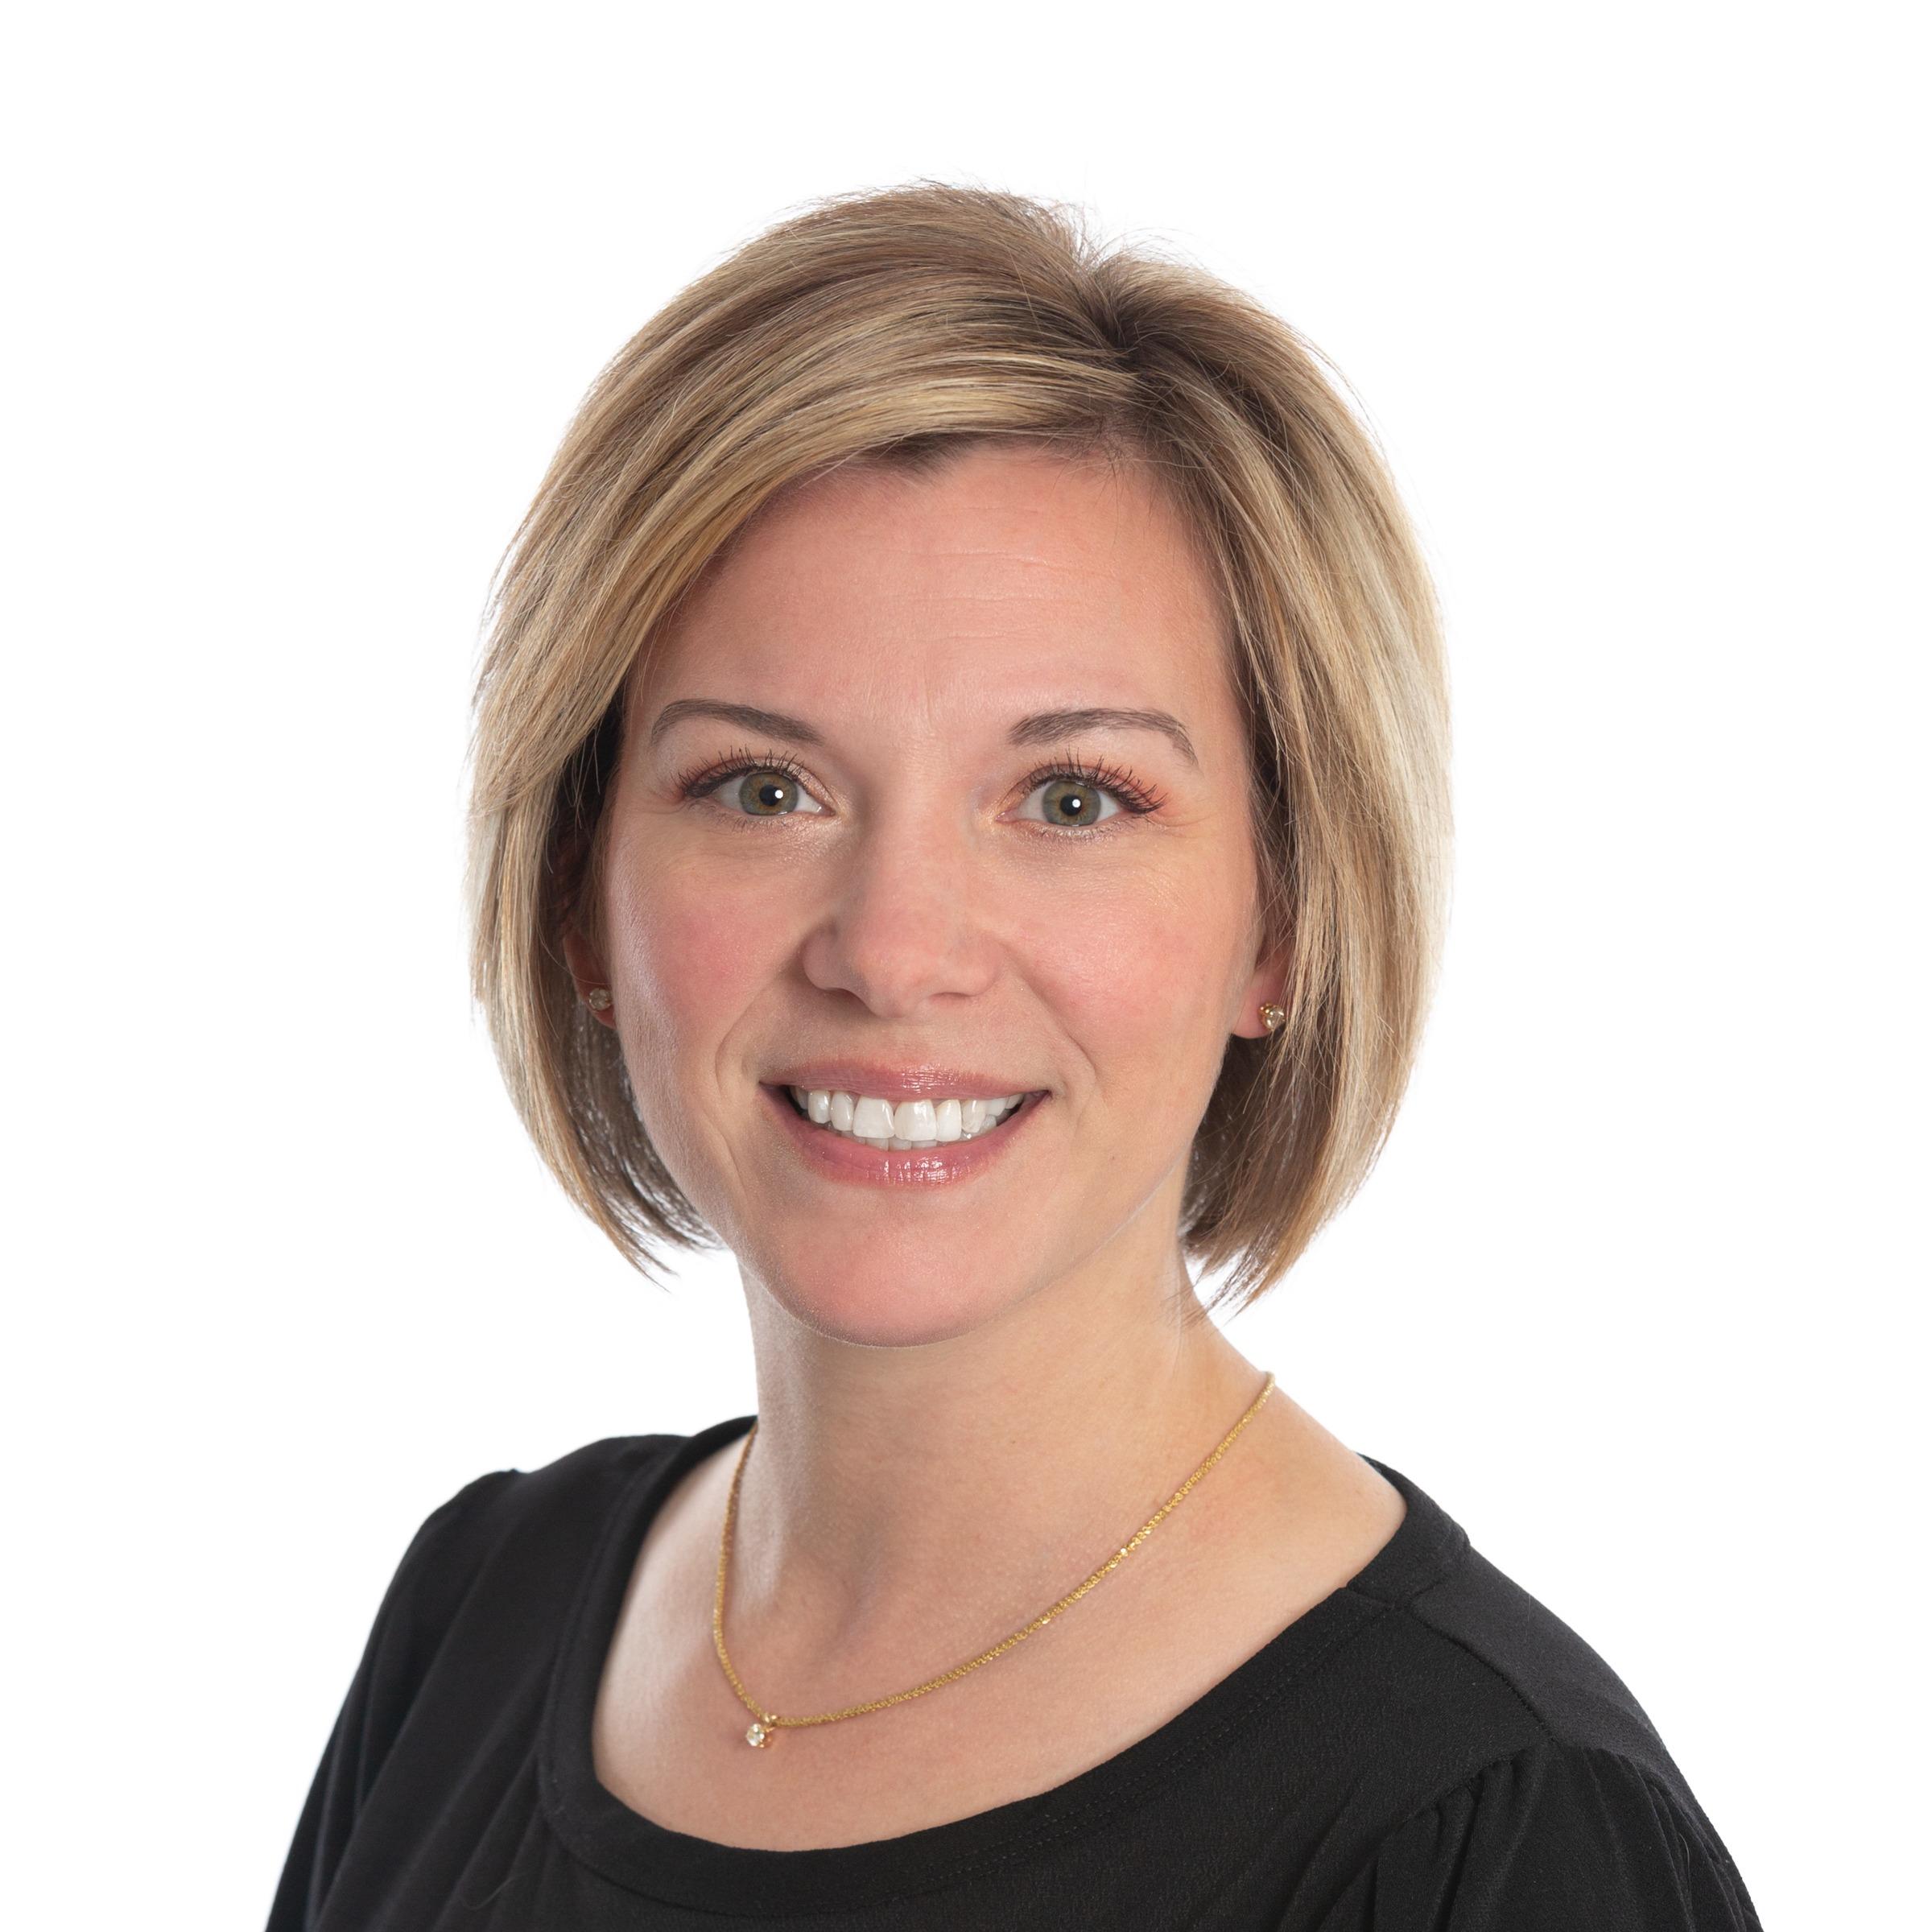 Kristen Pocock of Blackburn & Elrod Orthodontics